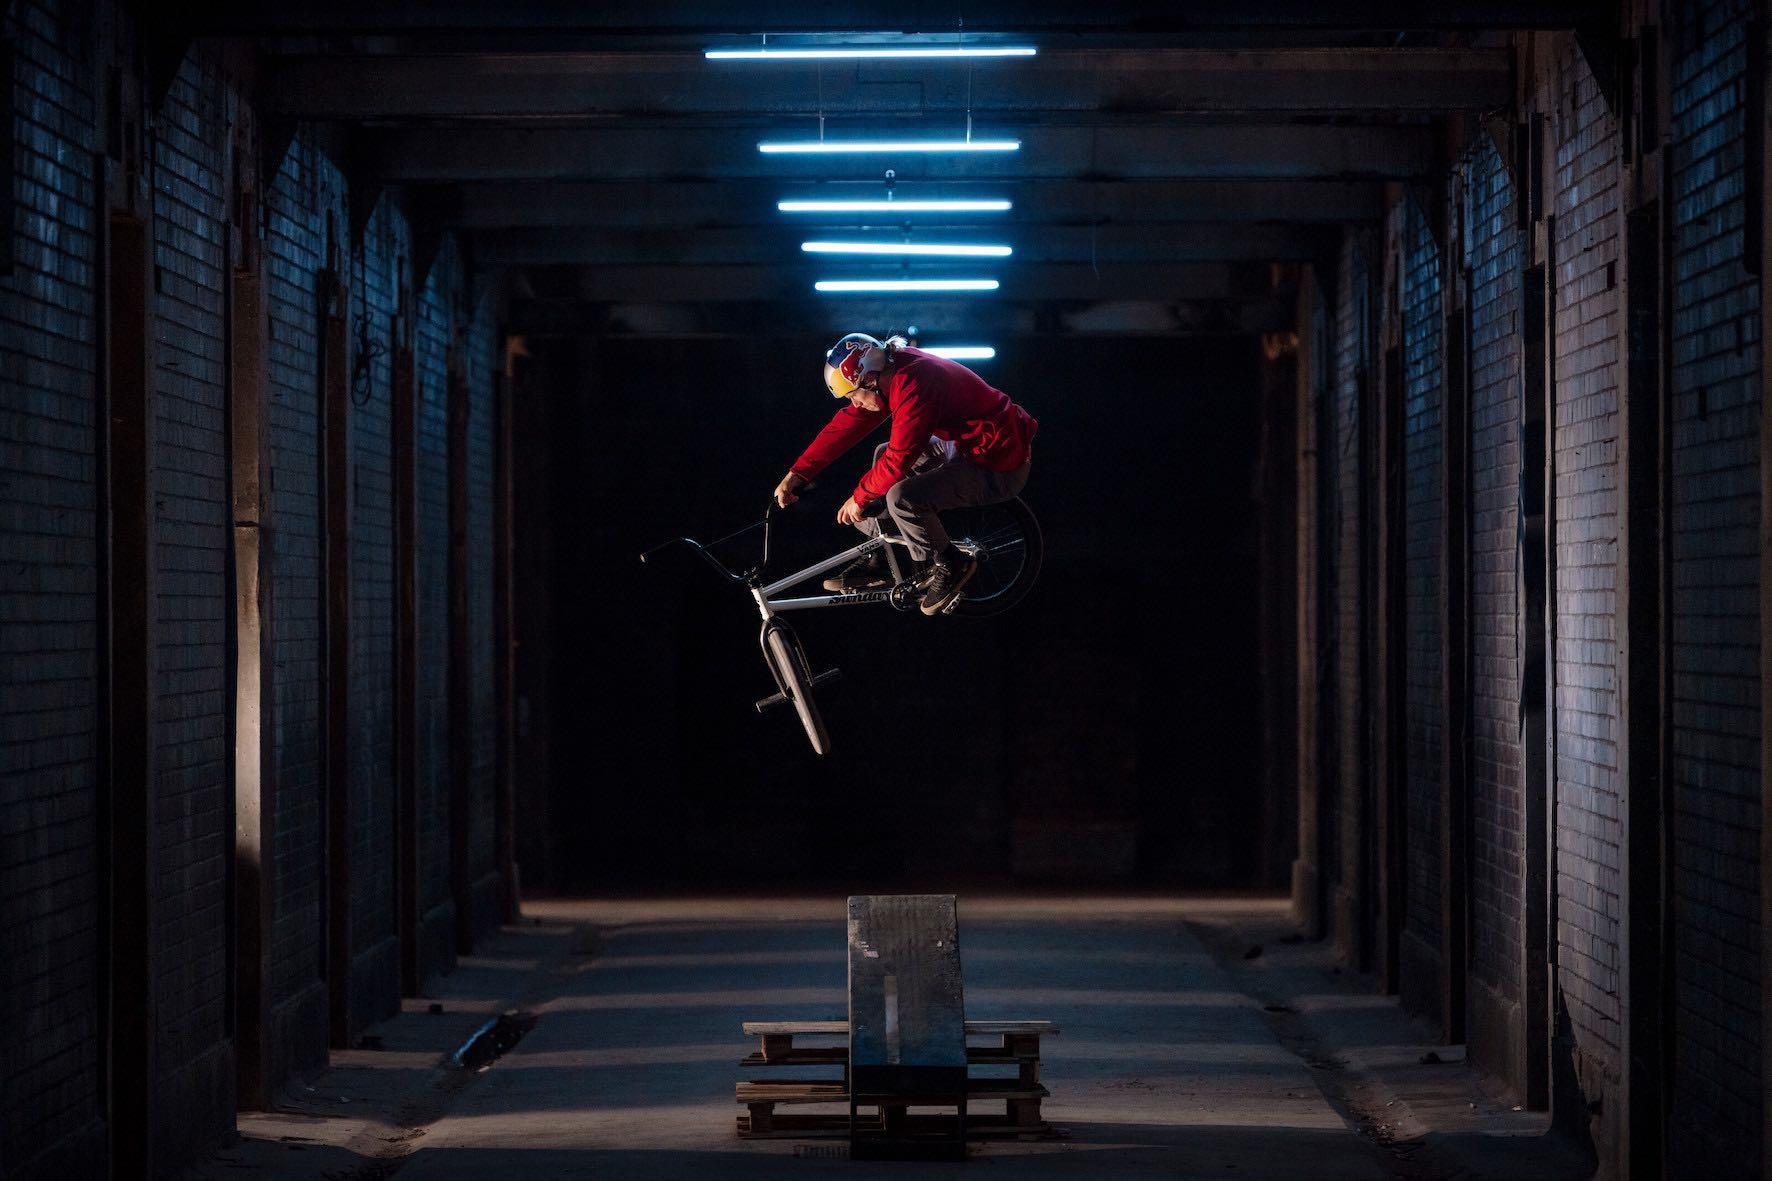 BMX Street riding with Murray Loubser